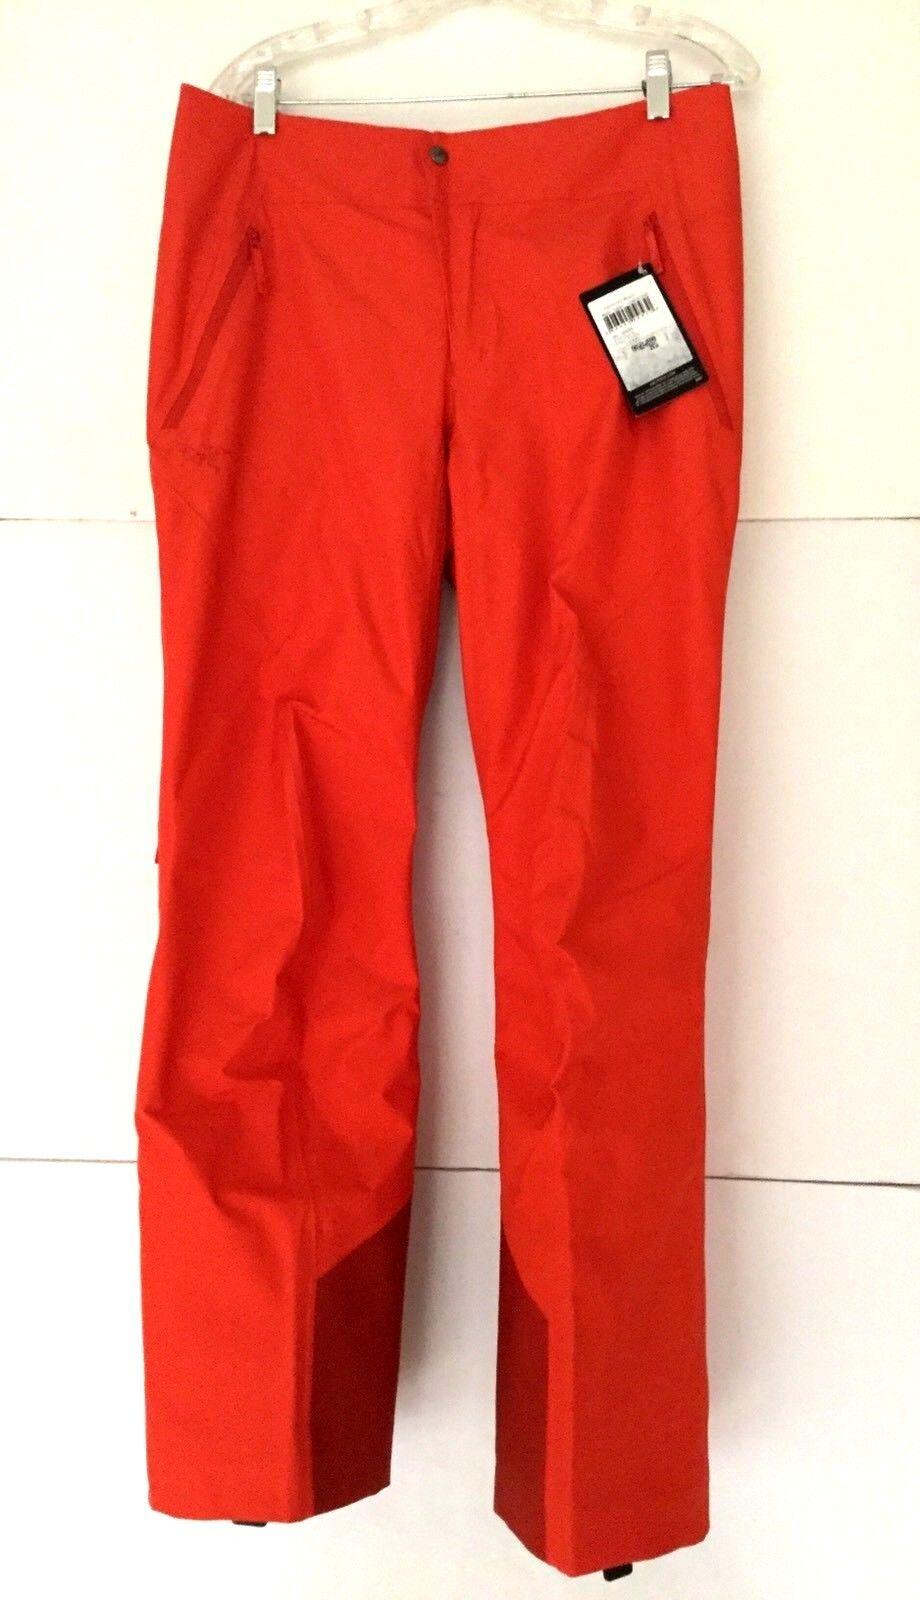 Arc'teryx Women's Kakeela insulated Ski  Pants Goretex Size 8 in Fiesta  we supply the best